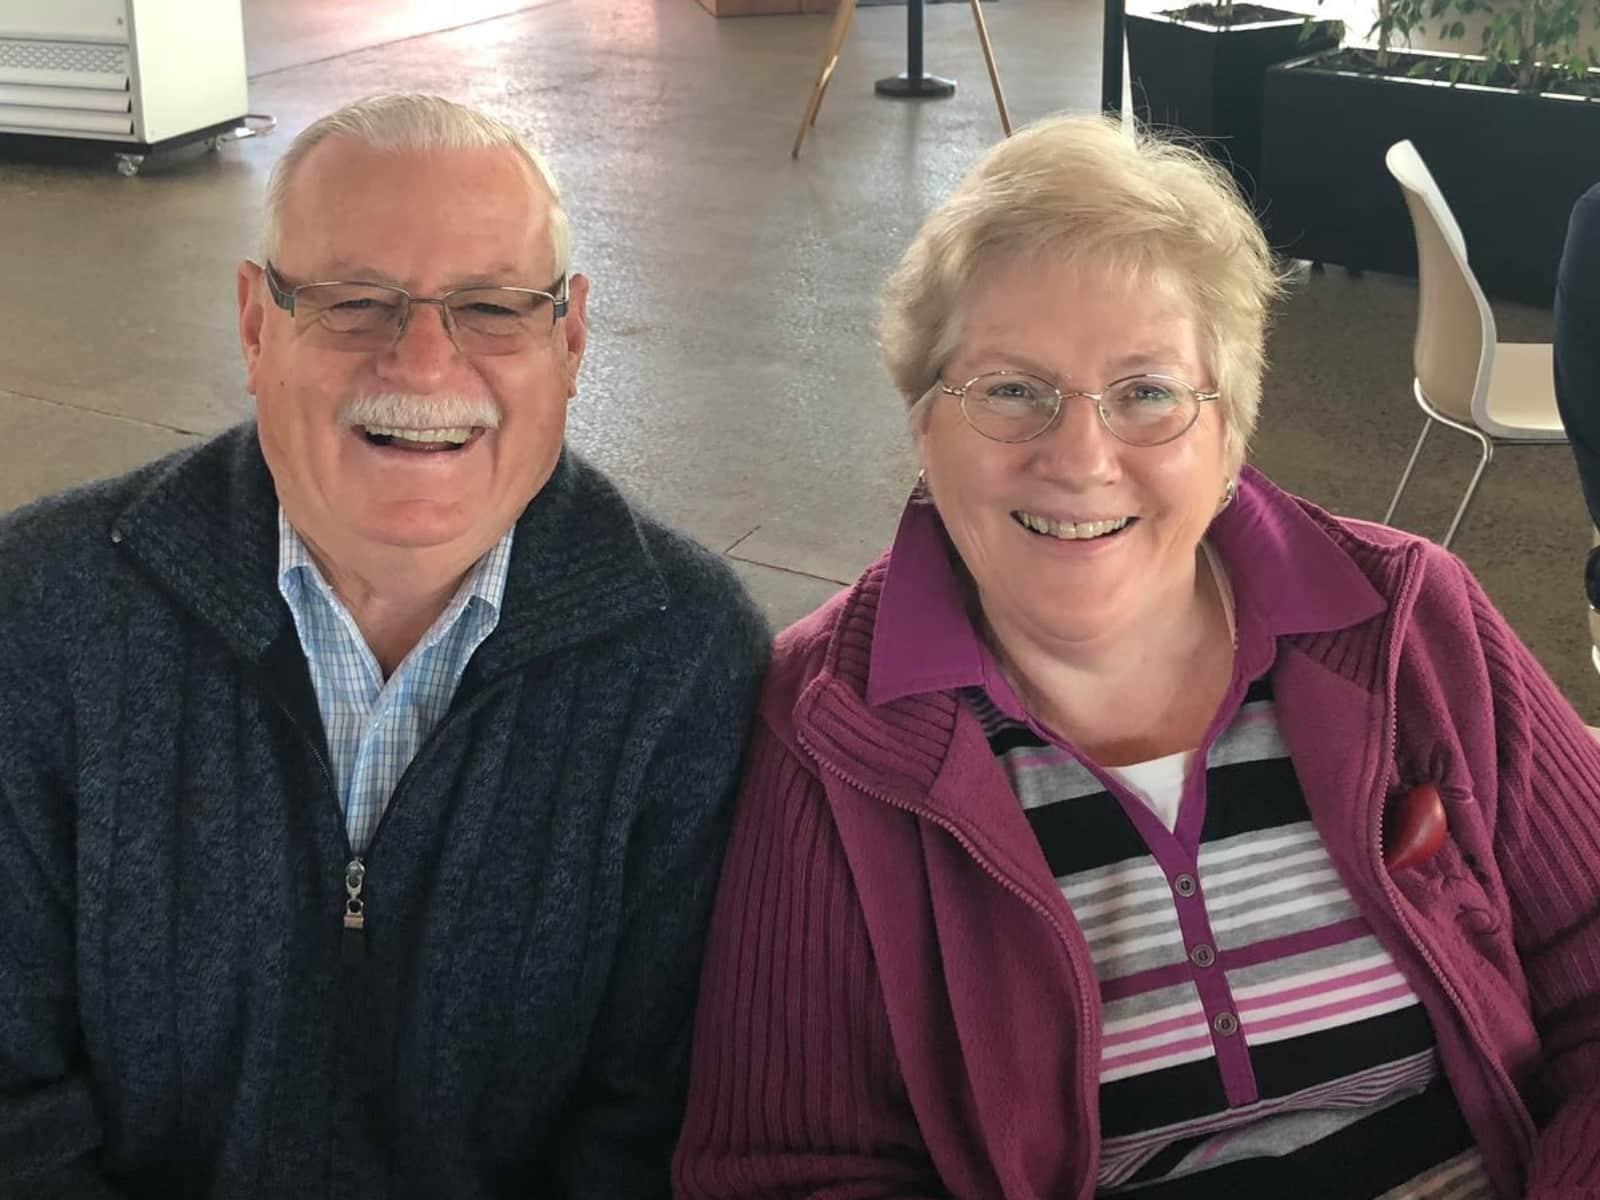 Nola & Geoff from Canberra, Australian Capital Territory, Australia